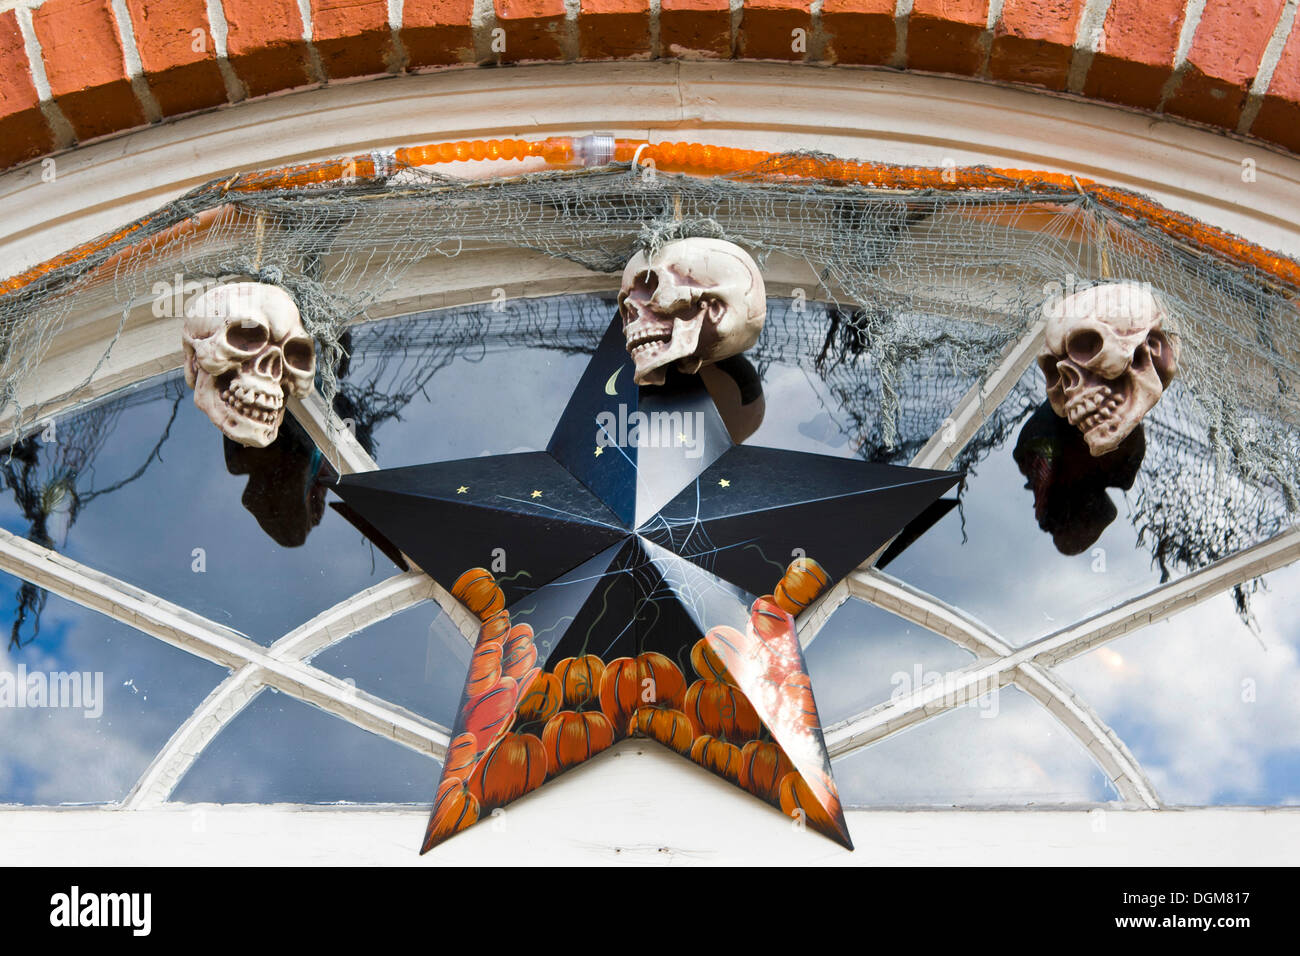 Halloween Dekoration Am Eingang Eines Ladens In Newburyport Massachusetts New England Usa Stockfotografie Alamy